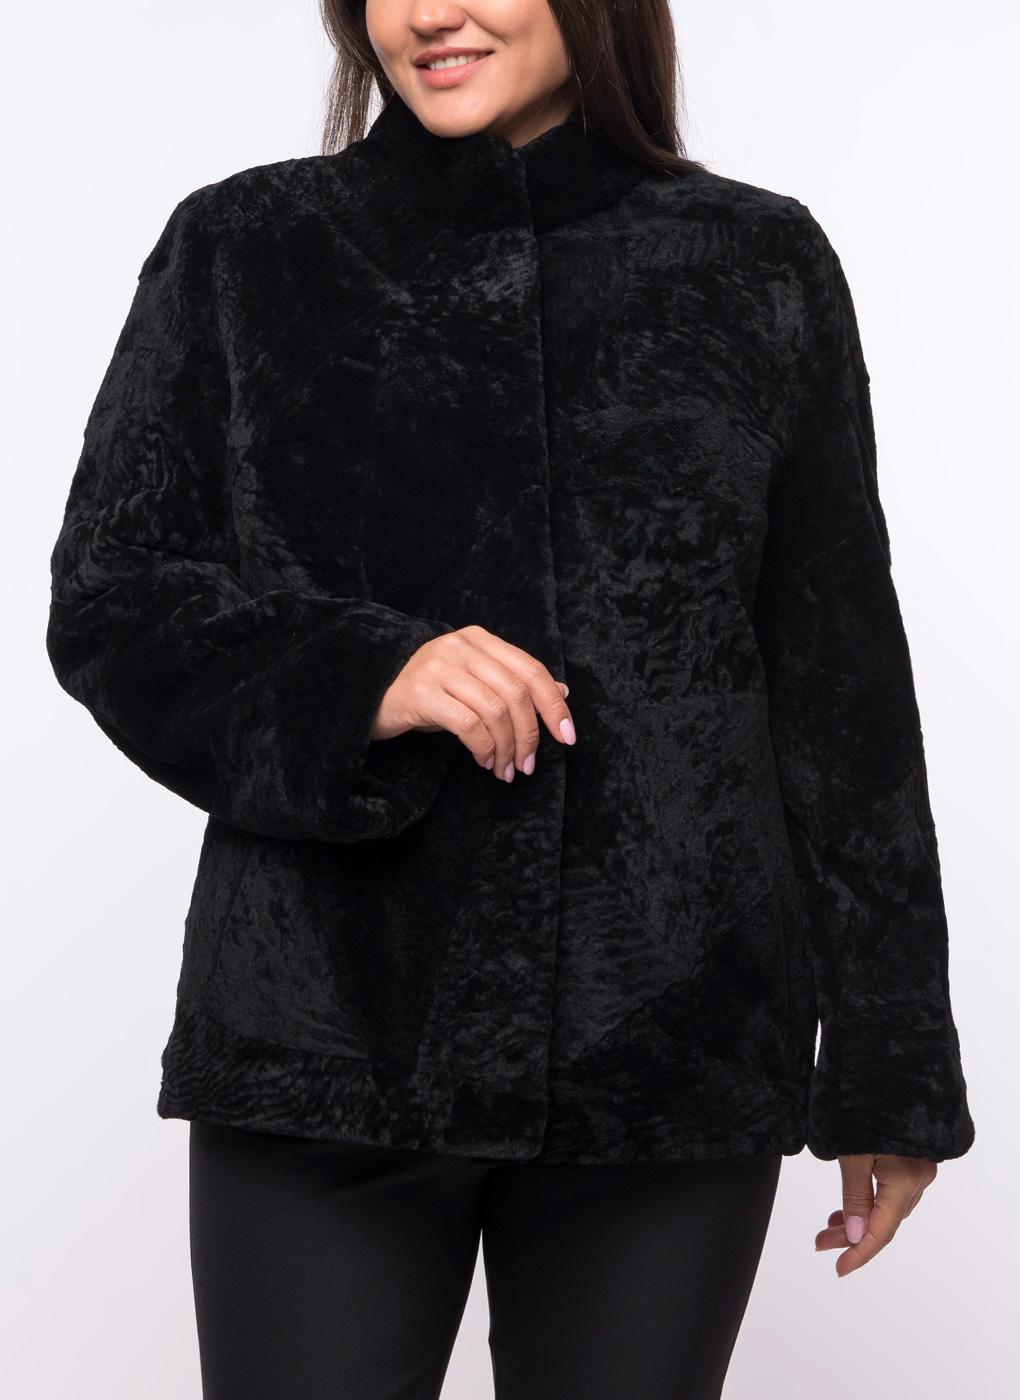 Куртка приталенная из астрагана 01, Dzhanbekoff